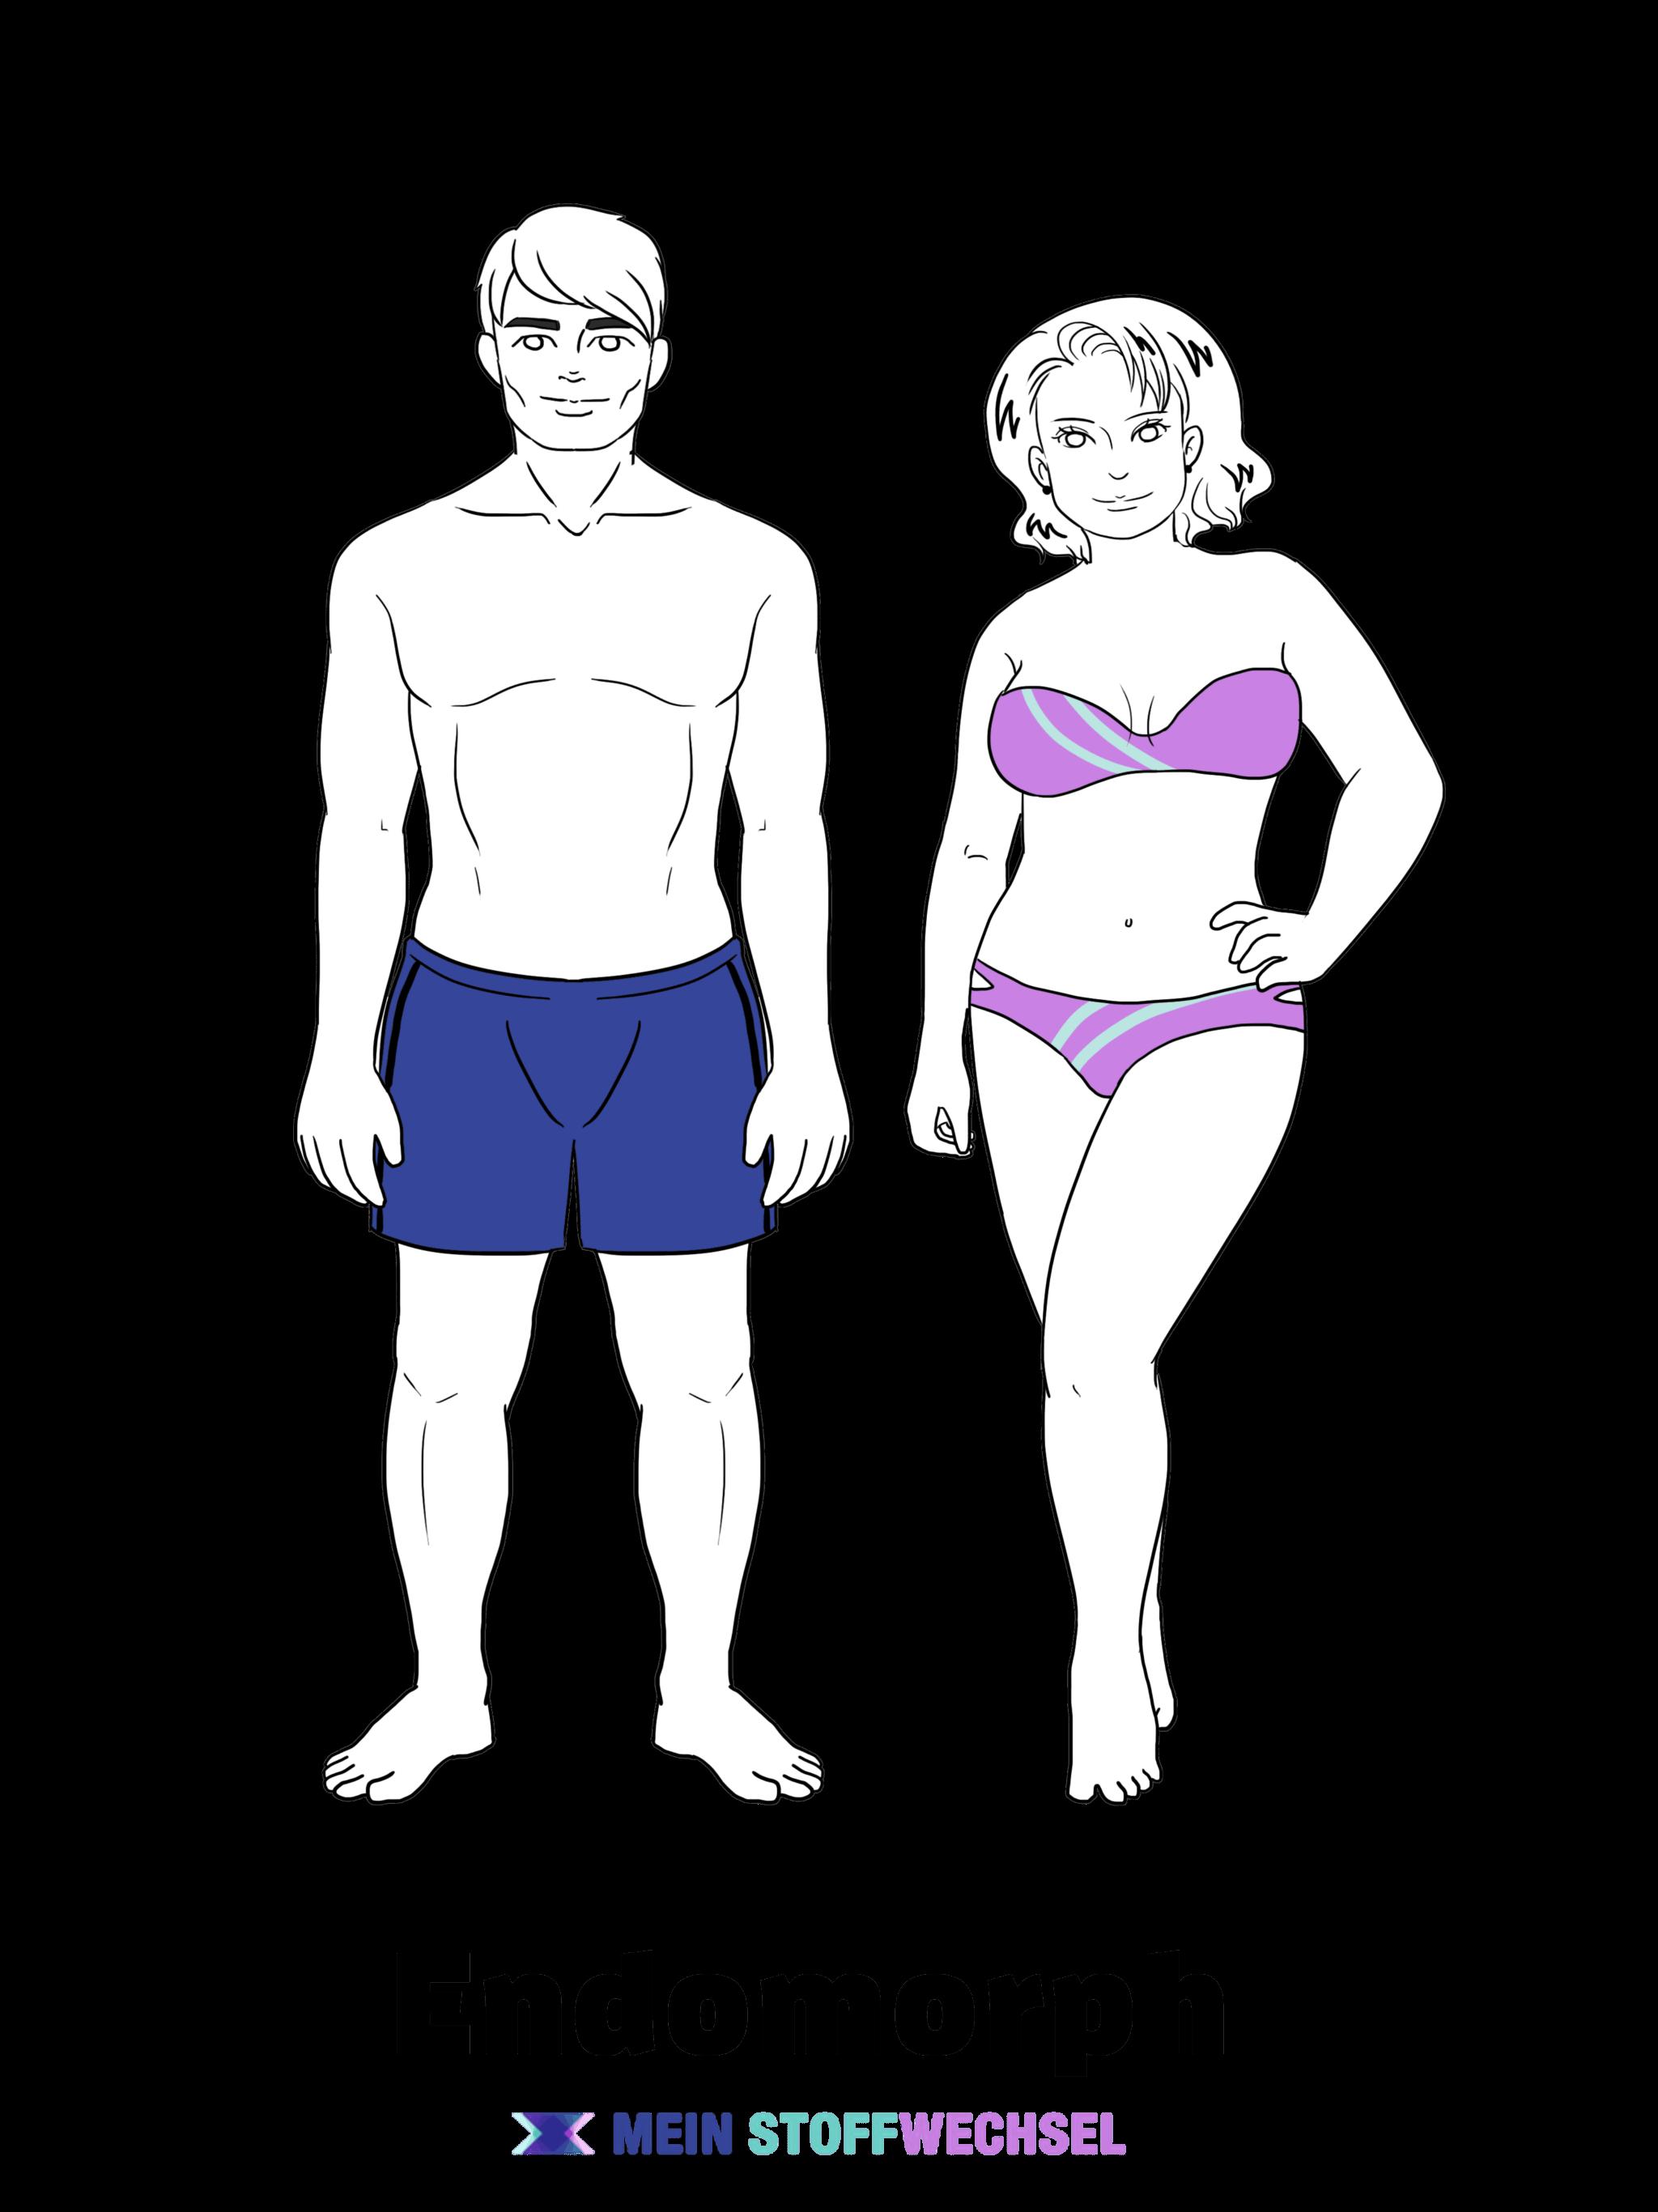 stoffwechseltyp Körpertyp endomorph